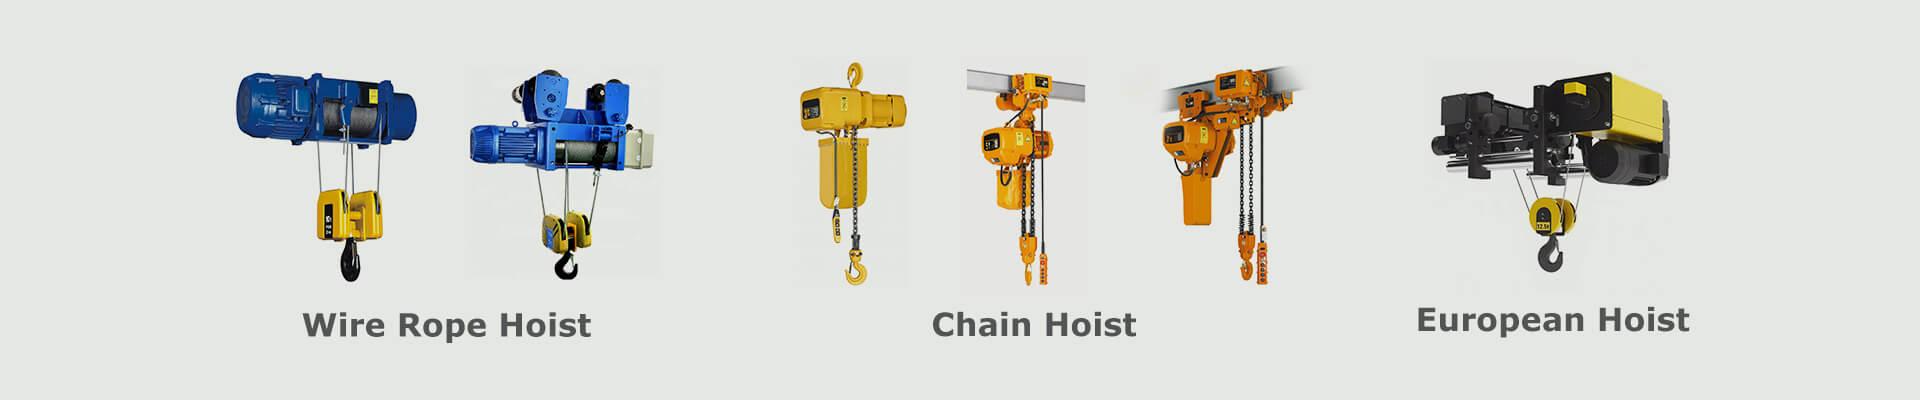 Chain Hoist for Sale | Hoist Machine